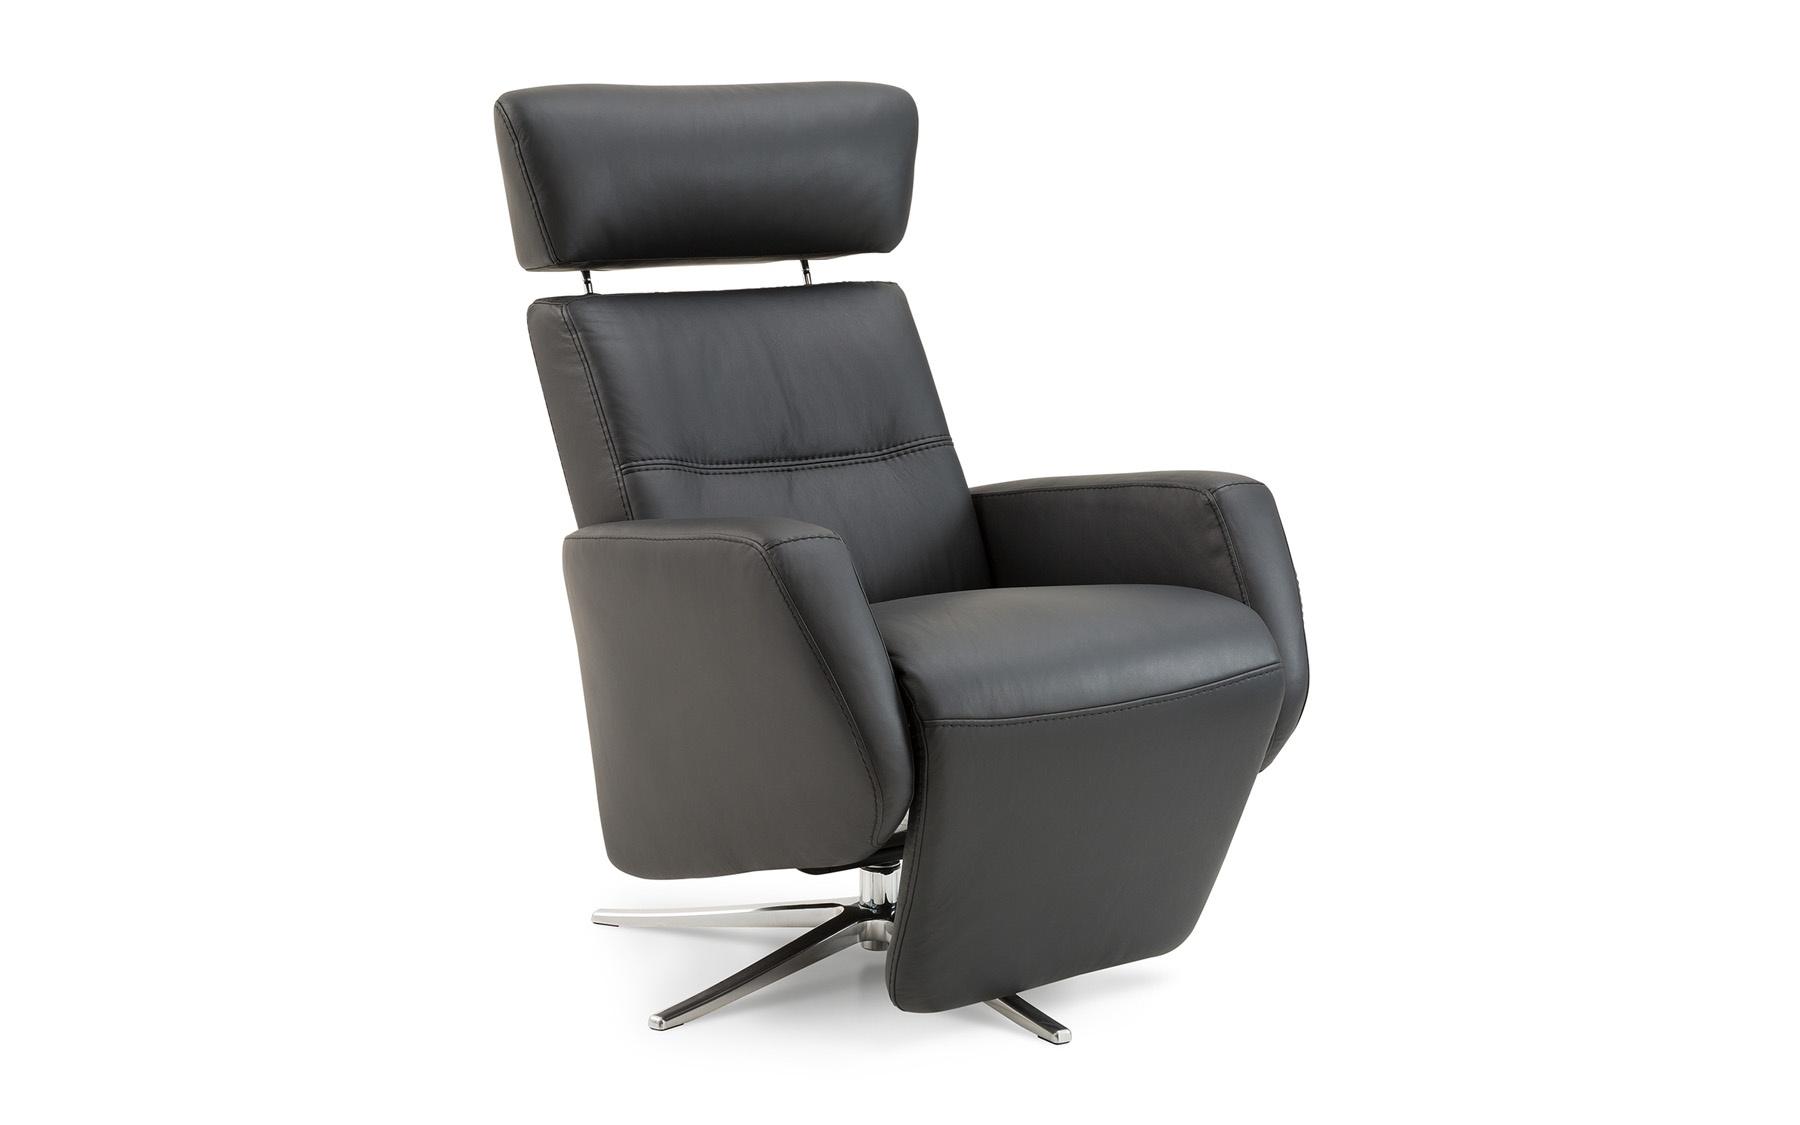 fauteuil inclinable cuir 883 fauteuils salons la. Black Bedroom Furniture Sets. Home Design Ideas